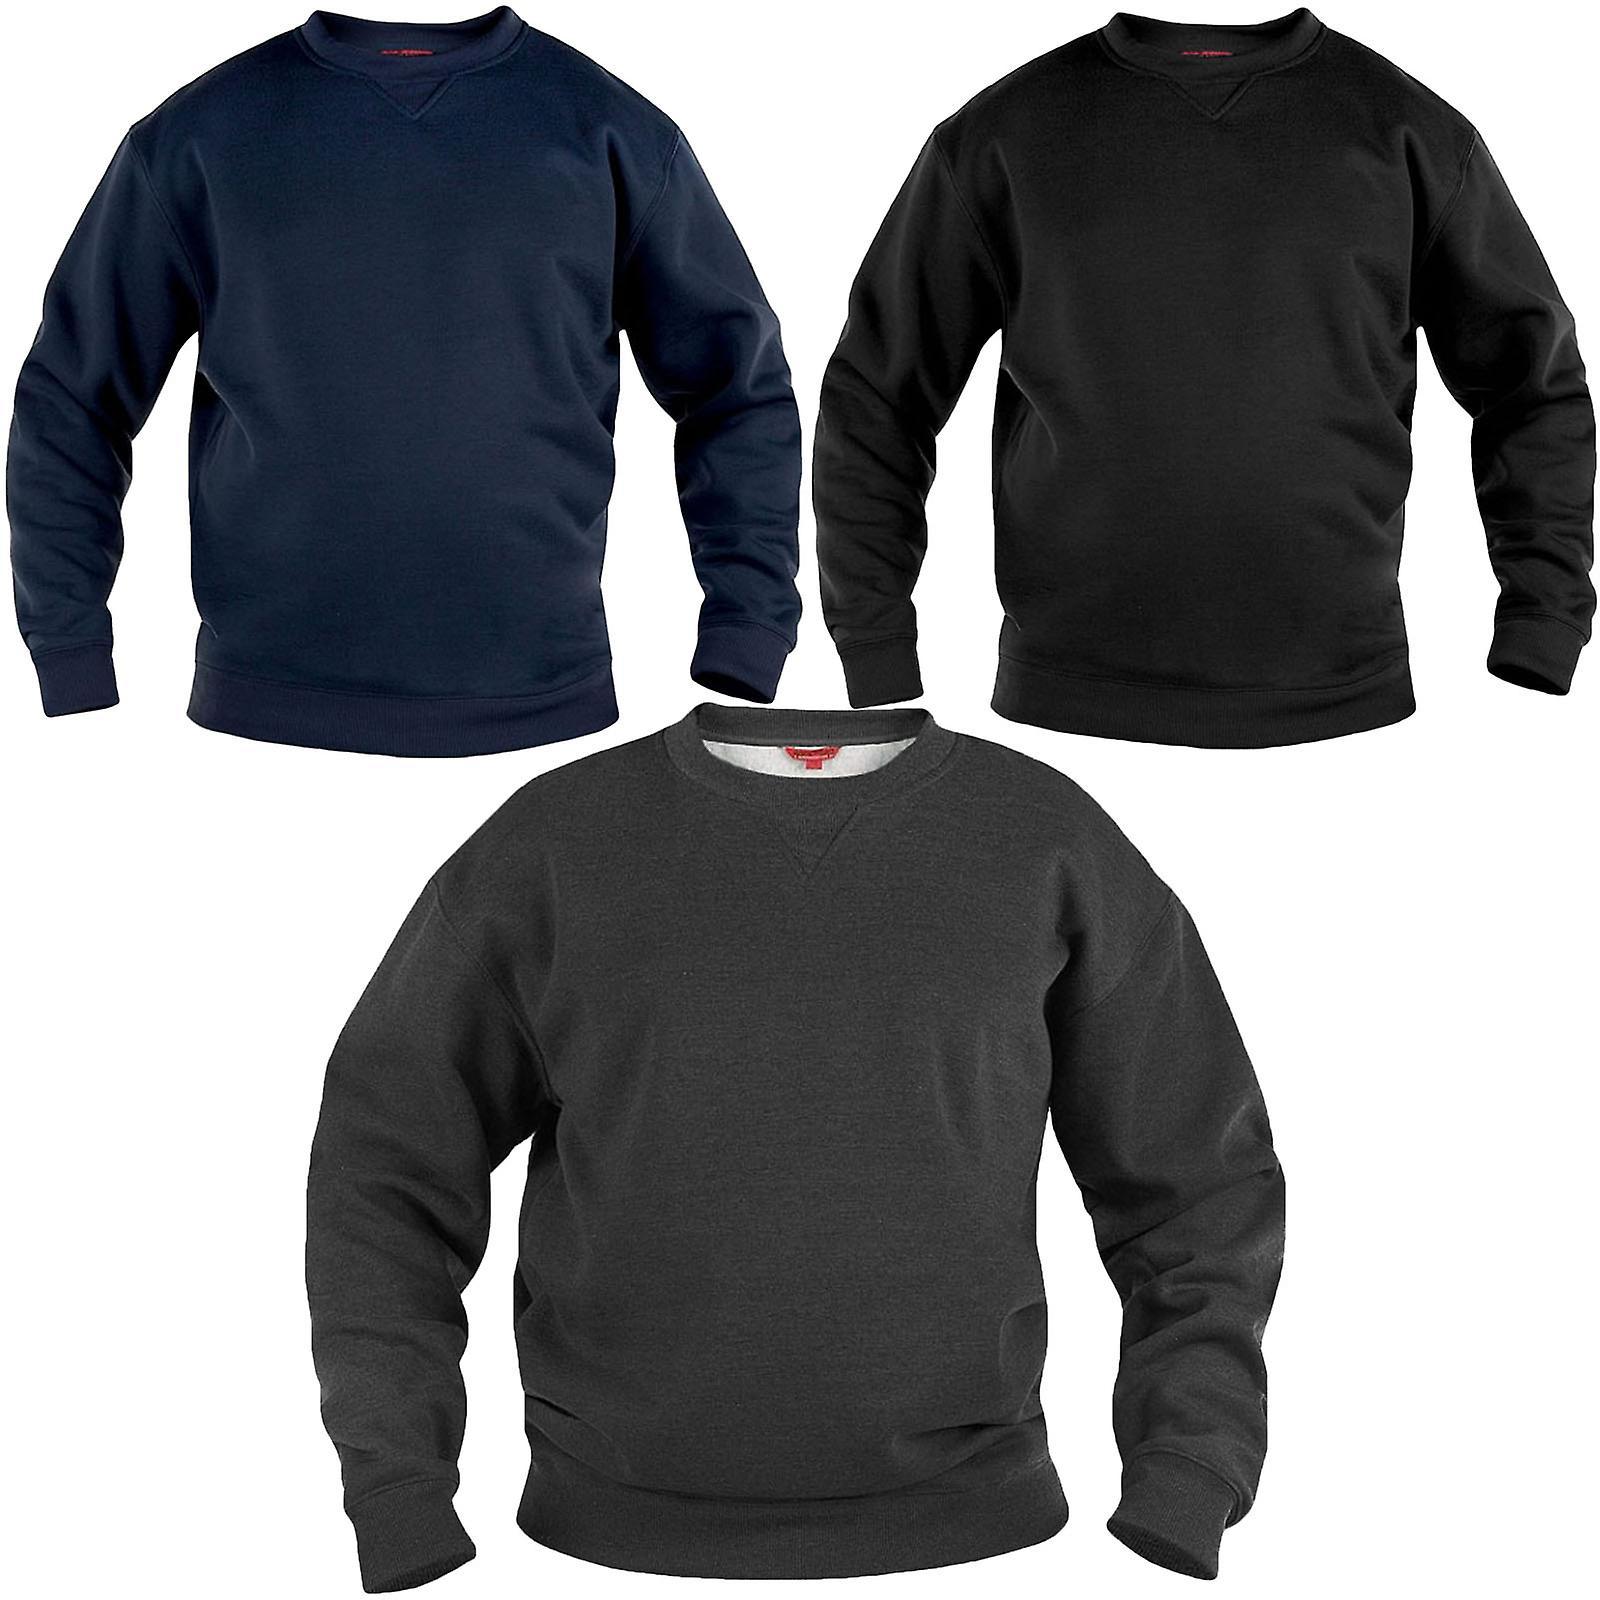 e10bf9f35 Duke D555 Rockford Mens Sweat Big Tall King Size Crew Neck Pullover  Sweatshirt